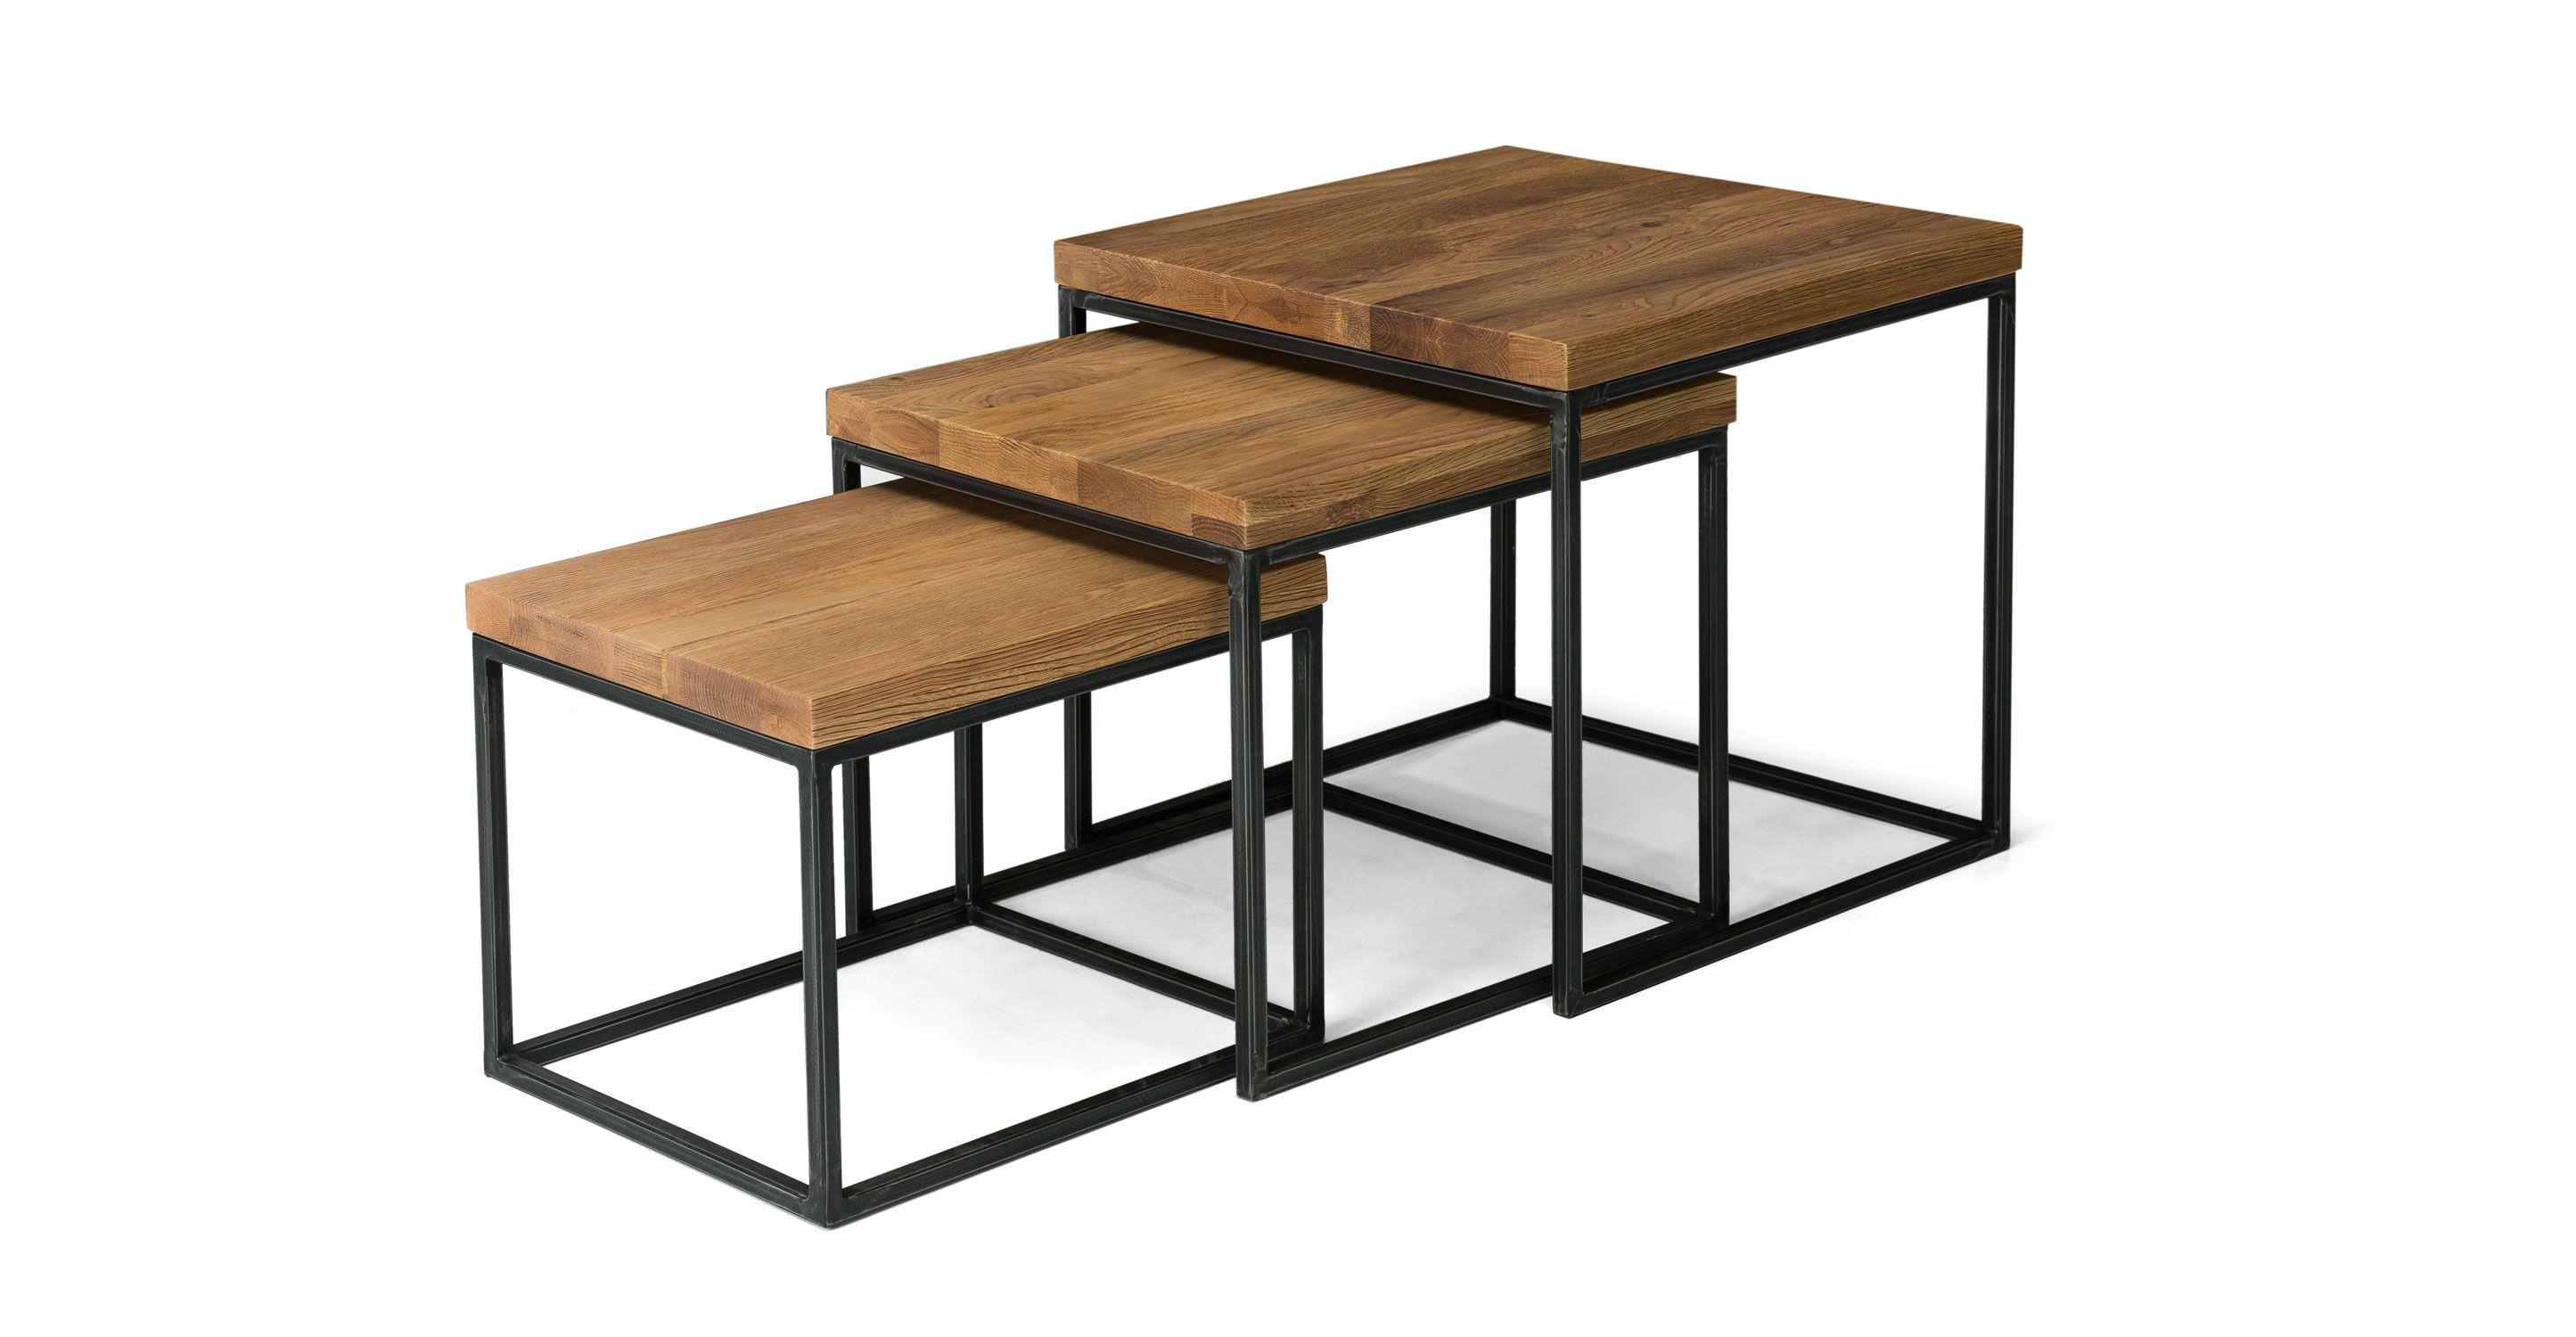 Vintage mitte jahrhundert wohnzimmer nesting tables in oak wood  metal legs  article taiga contemporary